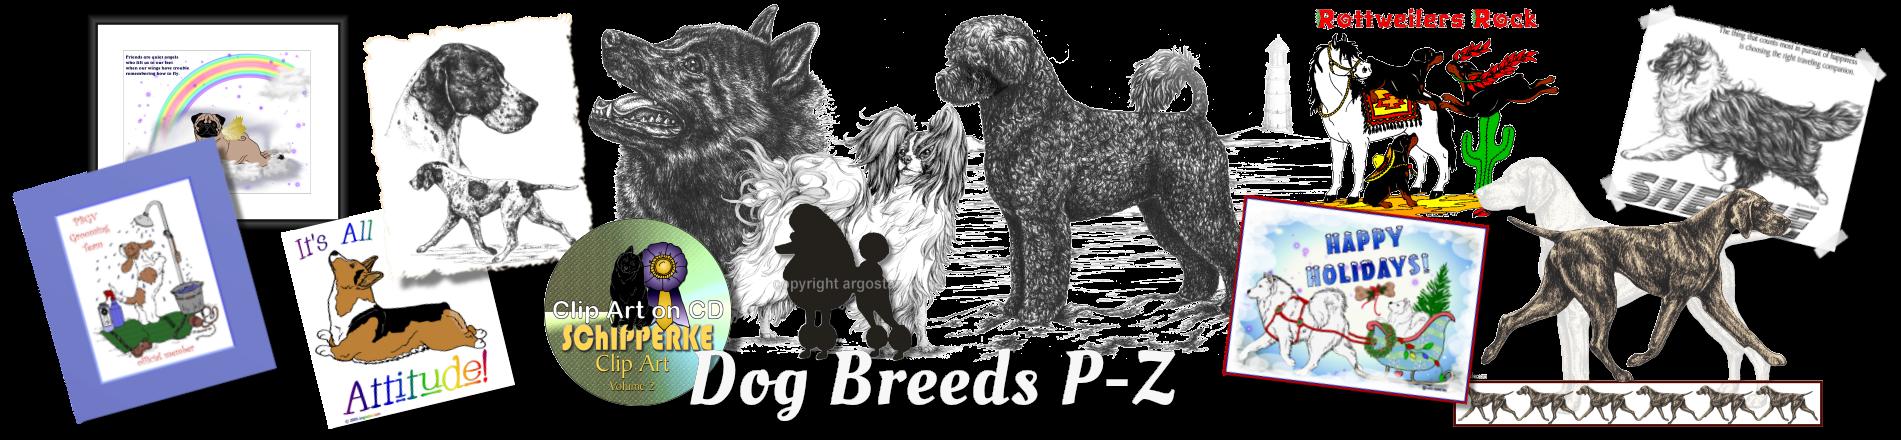 Portuguese water dog clipart jpg download Dog Store - Shop Dog Breeds P-Z shirts, clipart, prints, notecards ... jpg download